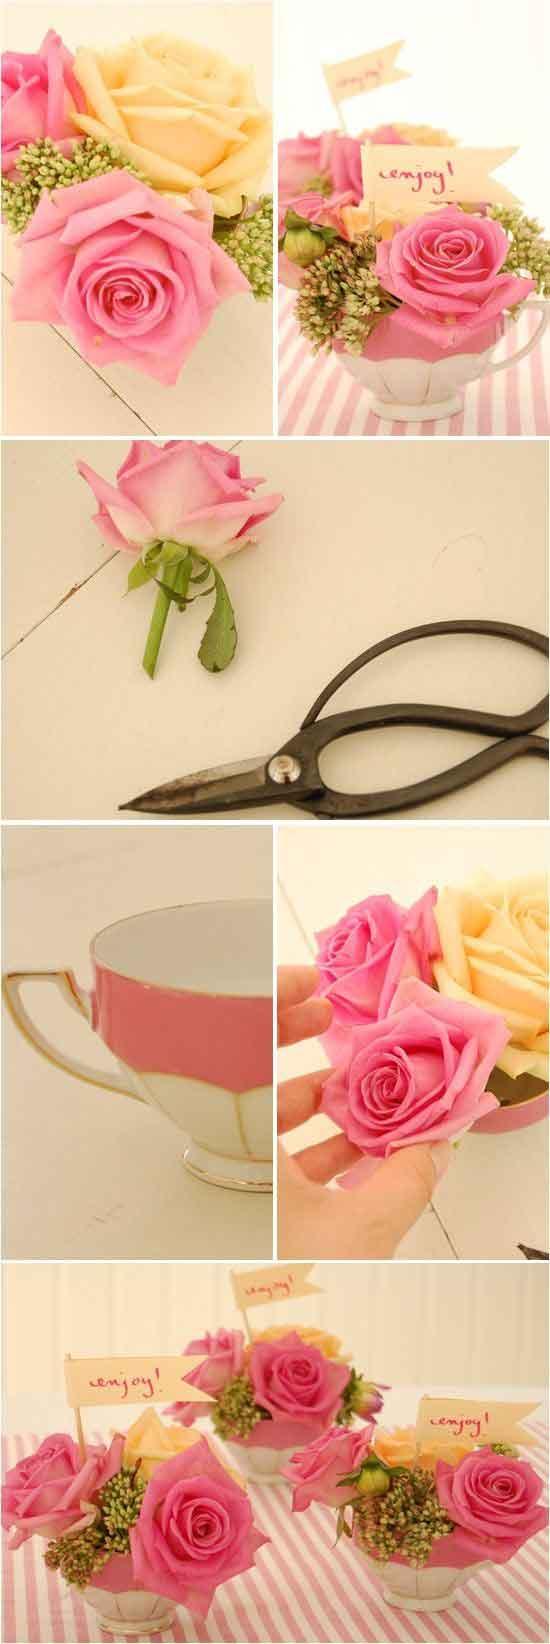 Como Hacer Arreglos De Flores Para Bodas Diy Actitudfem